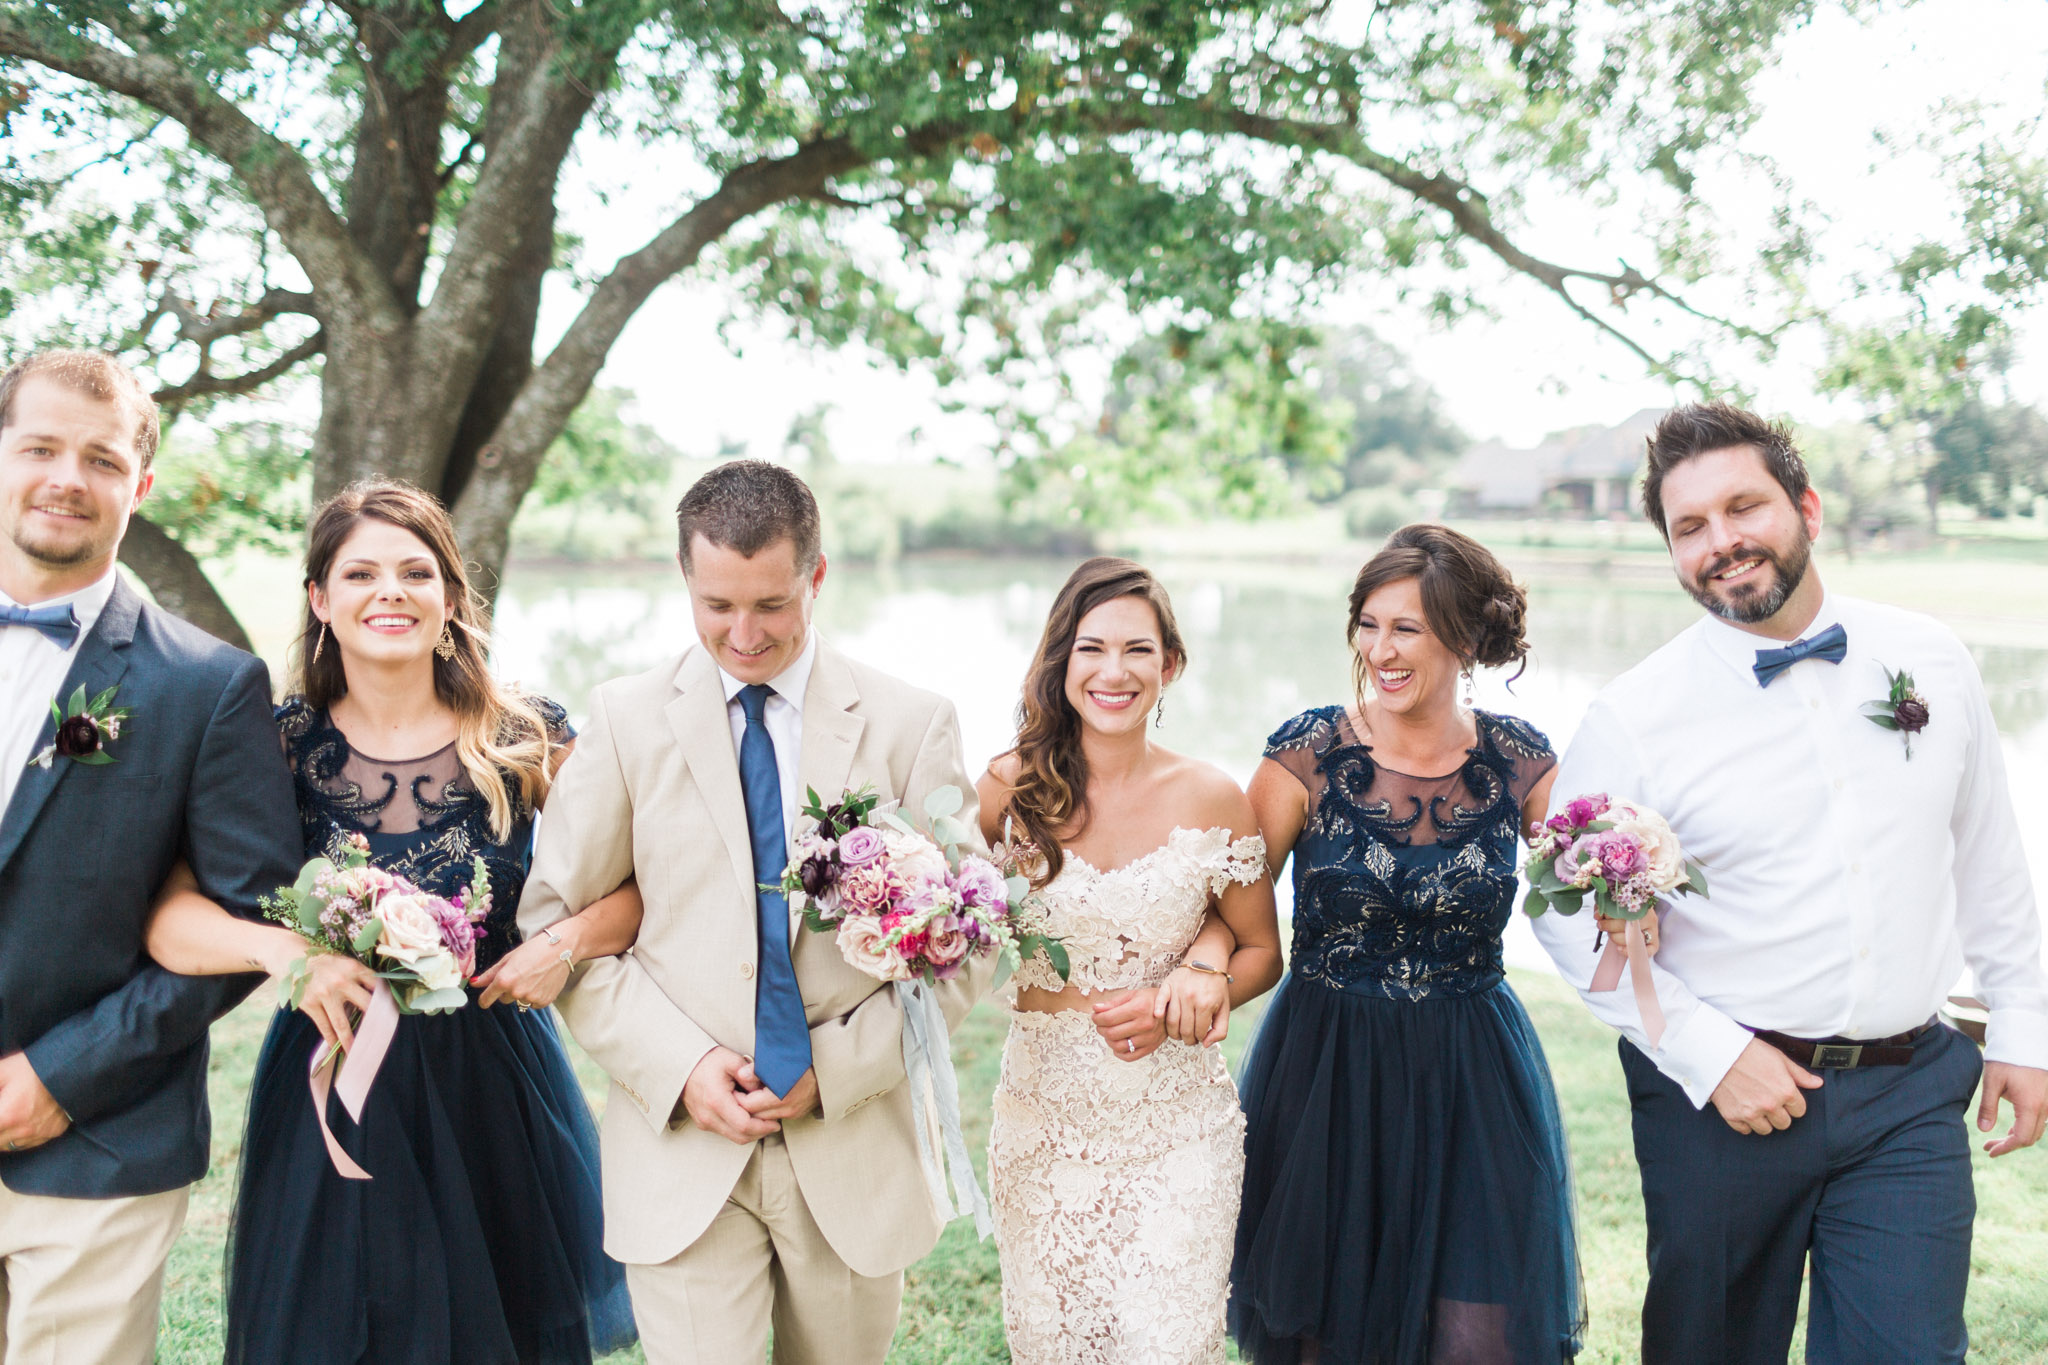 TheBigFakeWedding_DFW_wedding_photographer-18.jpg